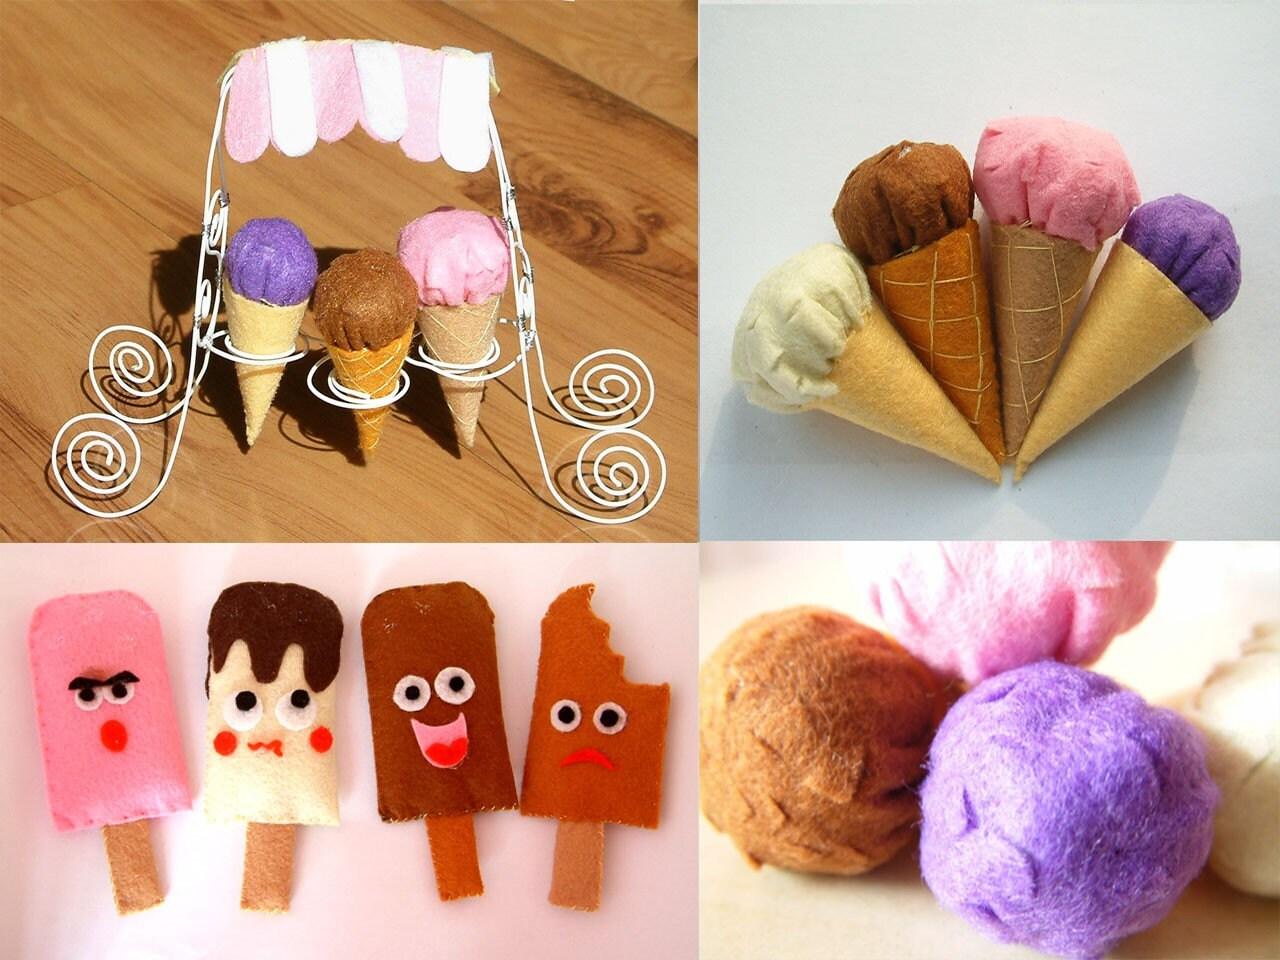 DIY Felt Ice CreamPDF Pattern And Instructions Via By Fairyfox